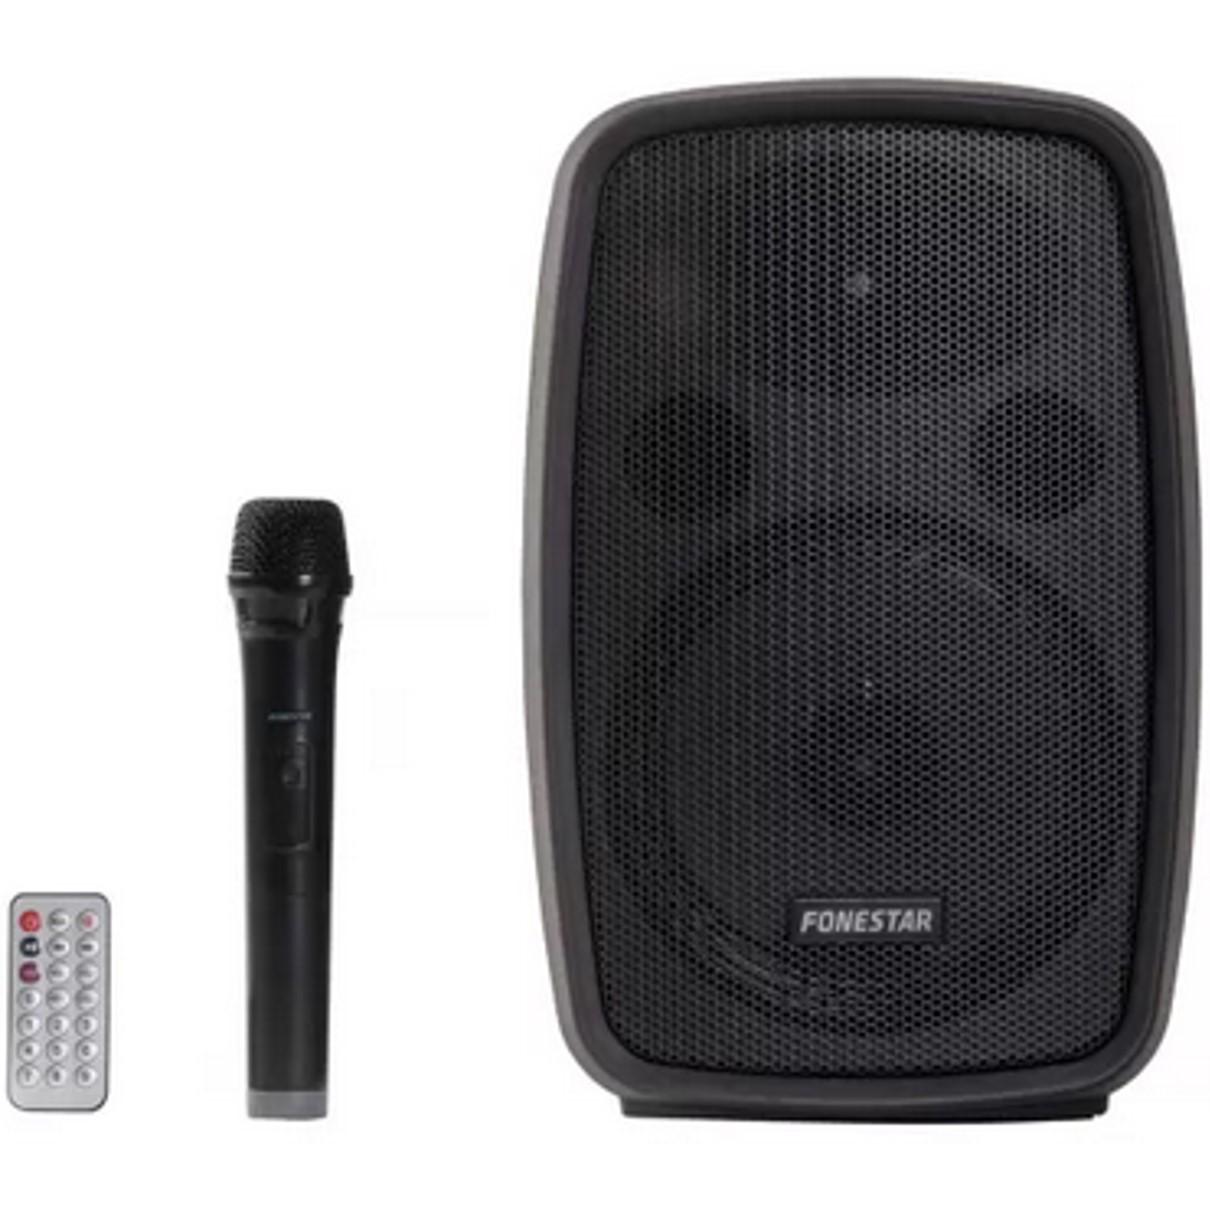 ALTAVOZ / AMPLIFICADOR PORTATIL FONESTAR AMPLY 100W BLUETOOTH / USB/ MICRO SD/ MP3/ RADIO FM / MICROFONO